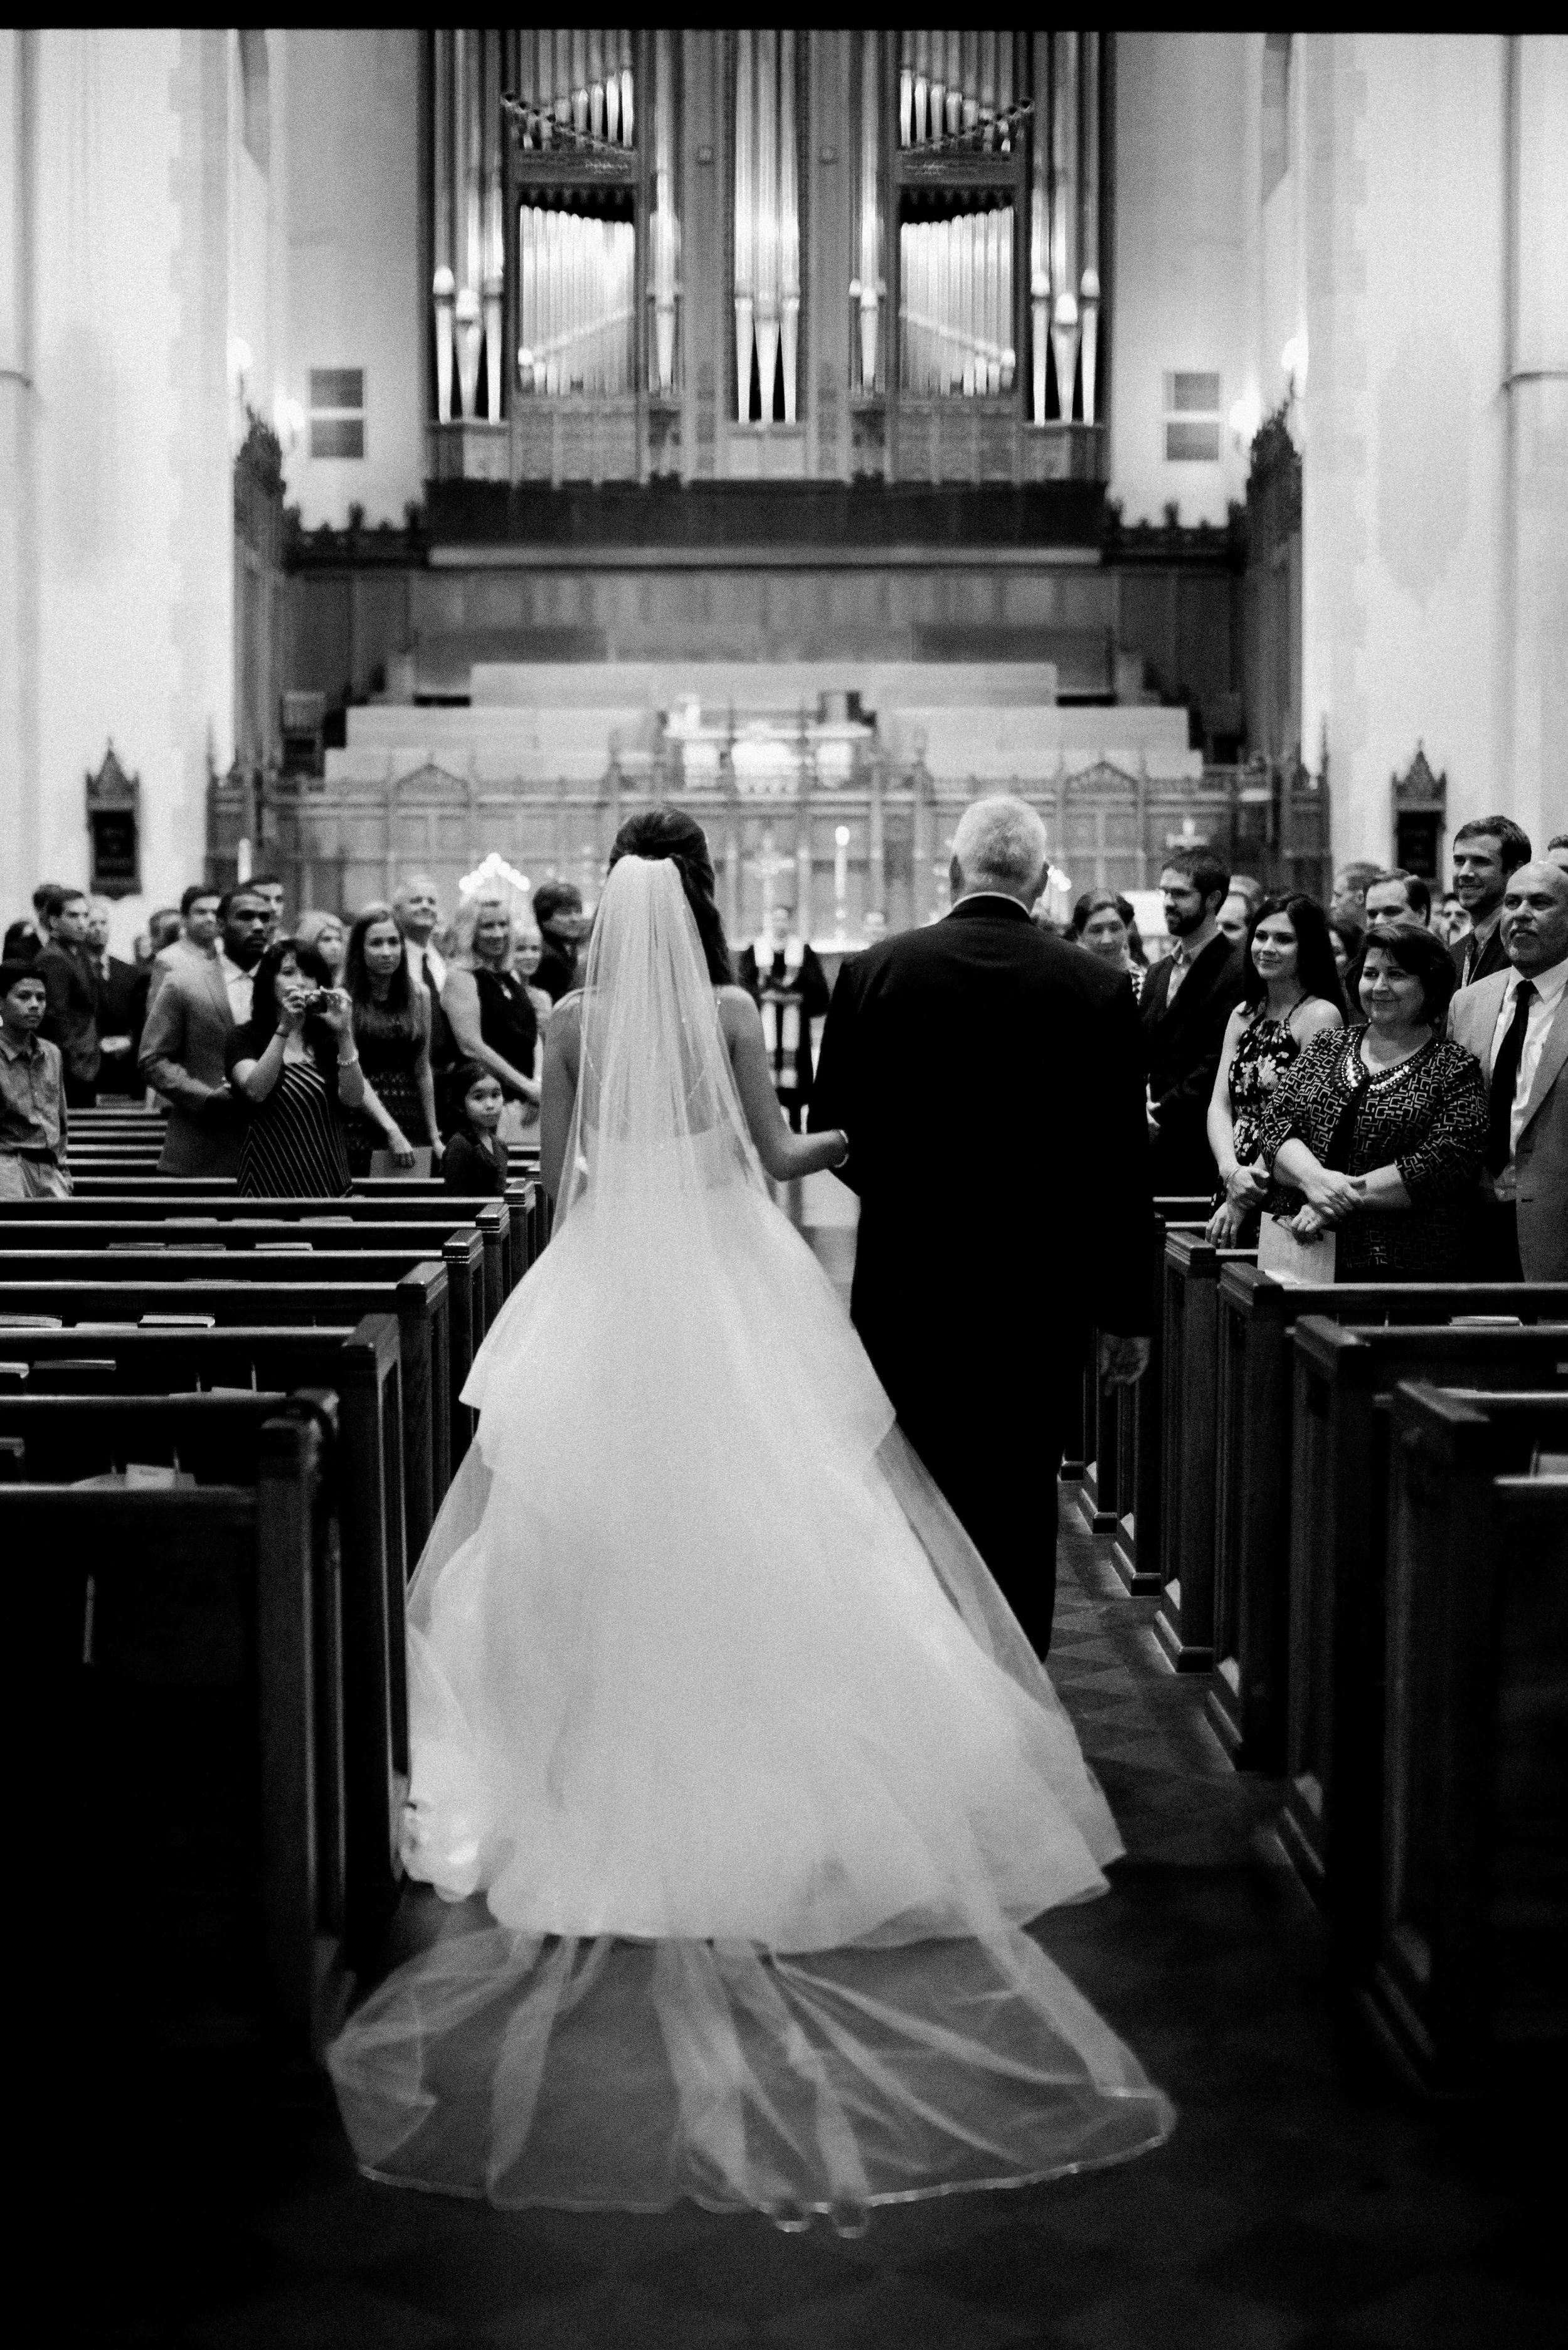 Dana-Fernandez-Photography-Weddings-in-Houston-Magazine-feature-Houston-wedding-photographer-film-32.jpg